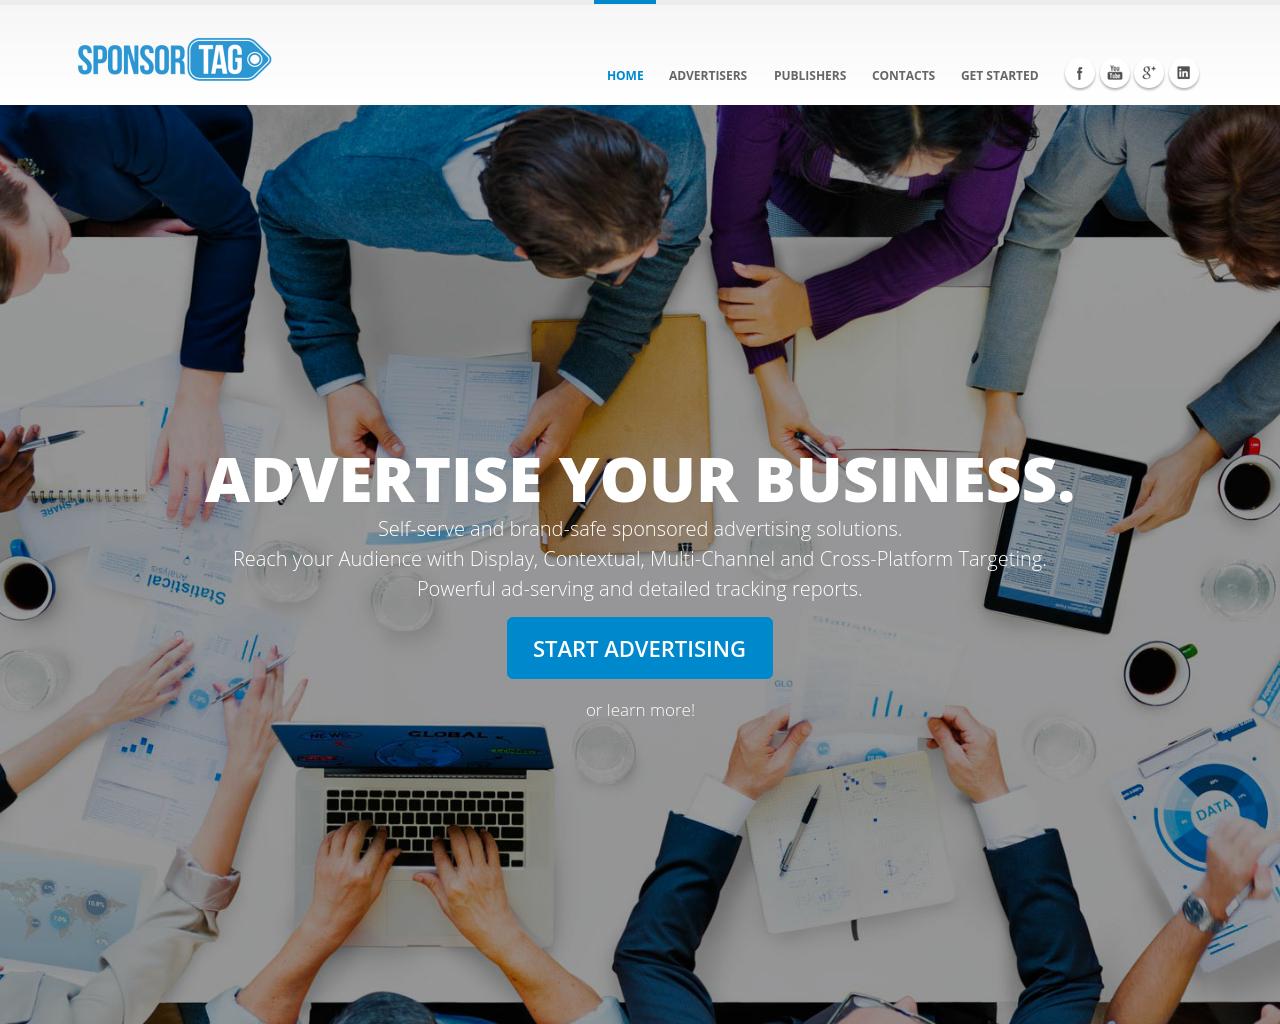 SponsorTag-Advertising-Reviews-Pricing